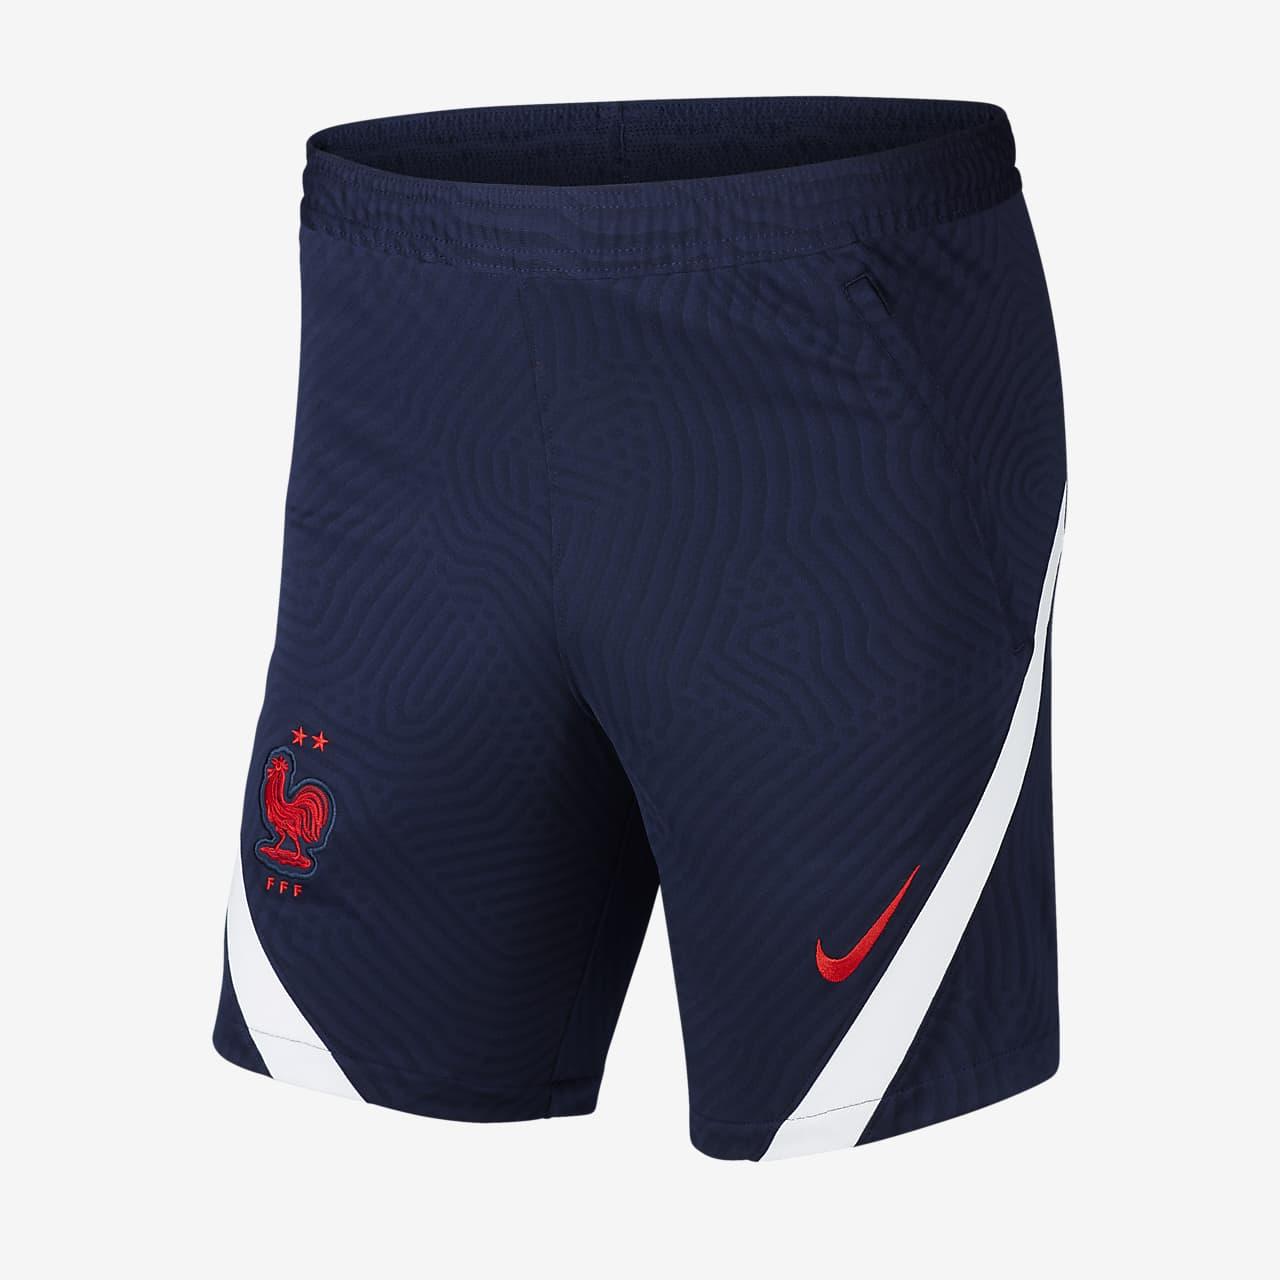 FFF Strike Men's Football Shorts